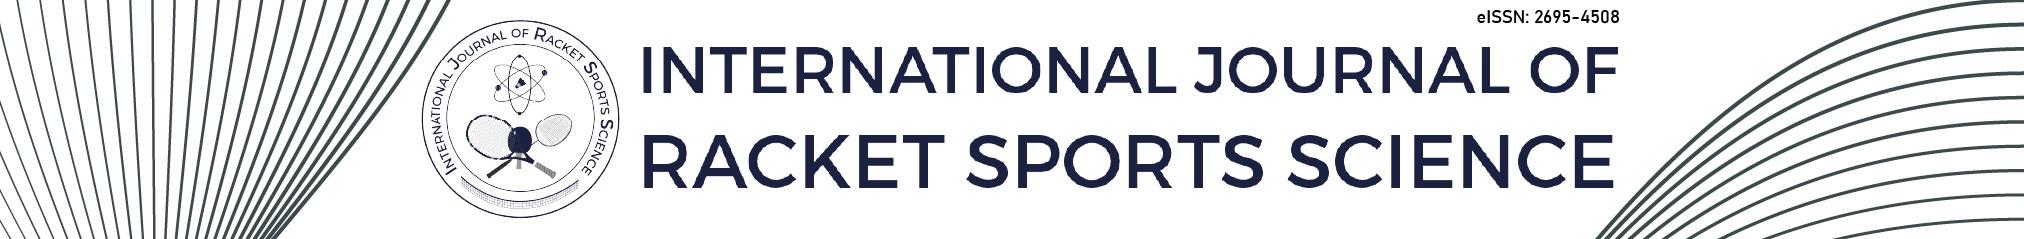 International Journal of Racket Sports Science